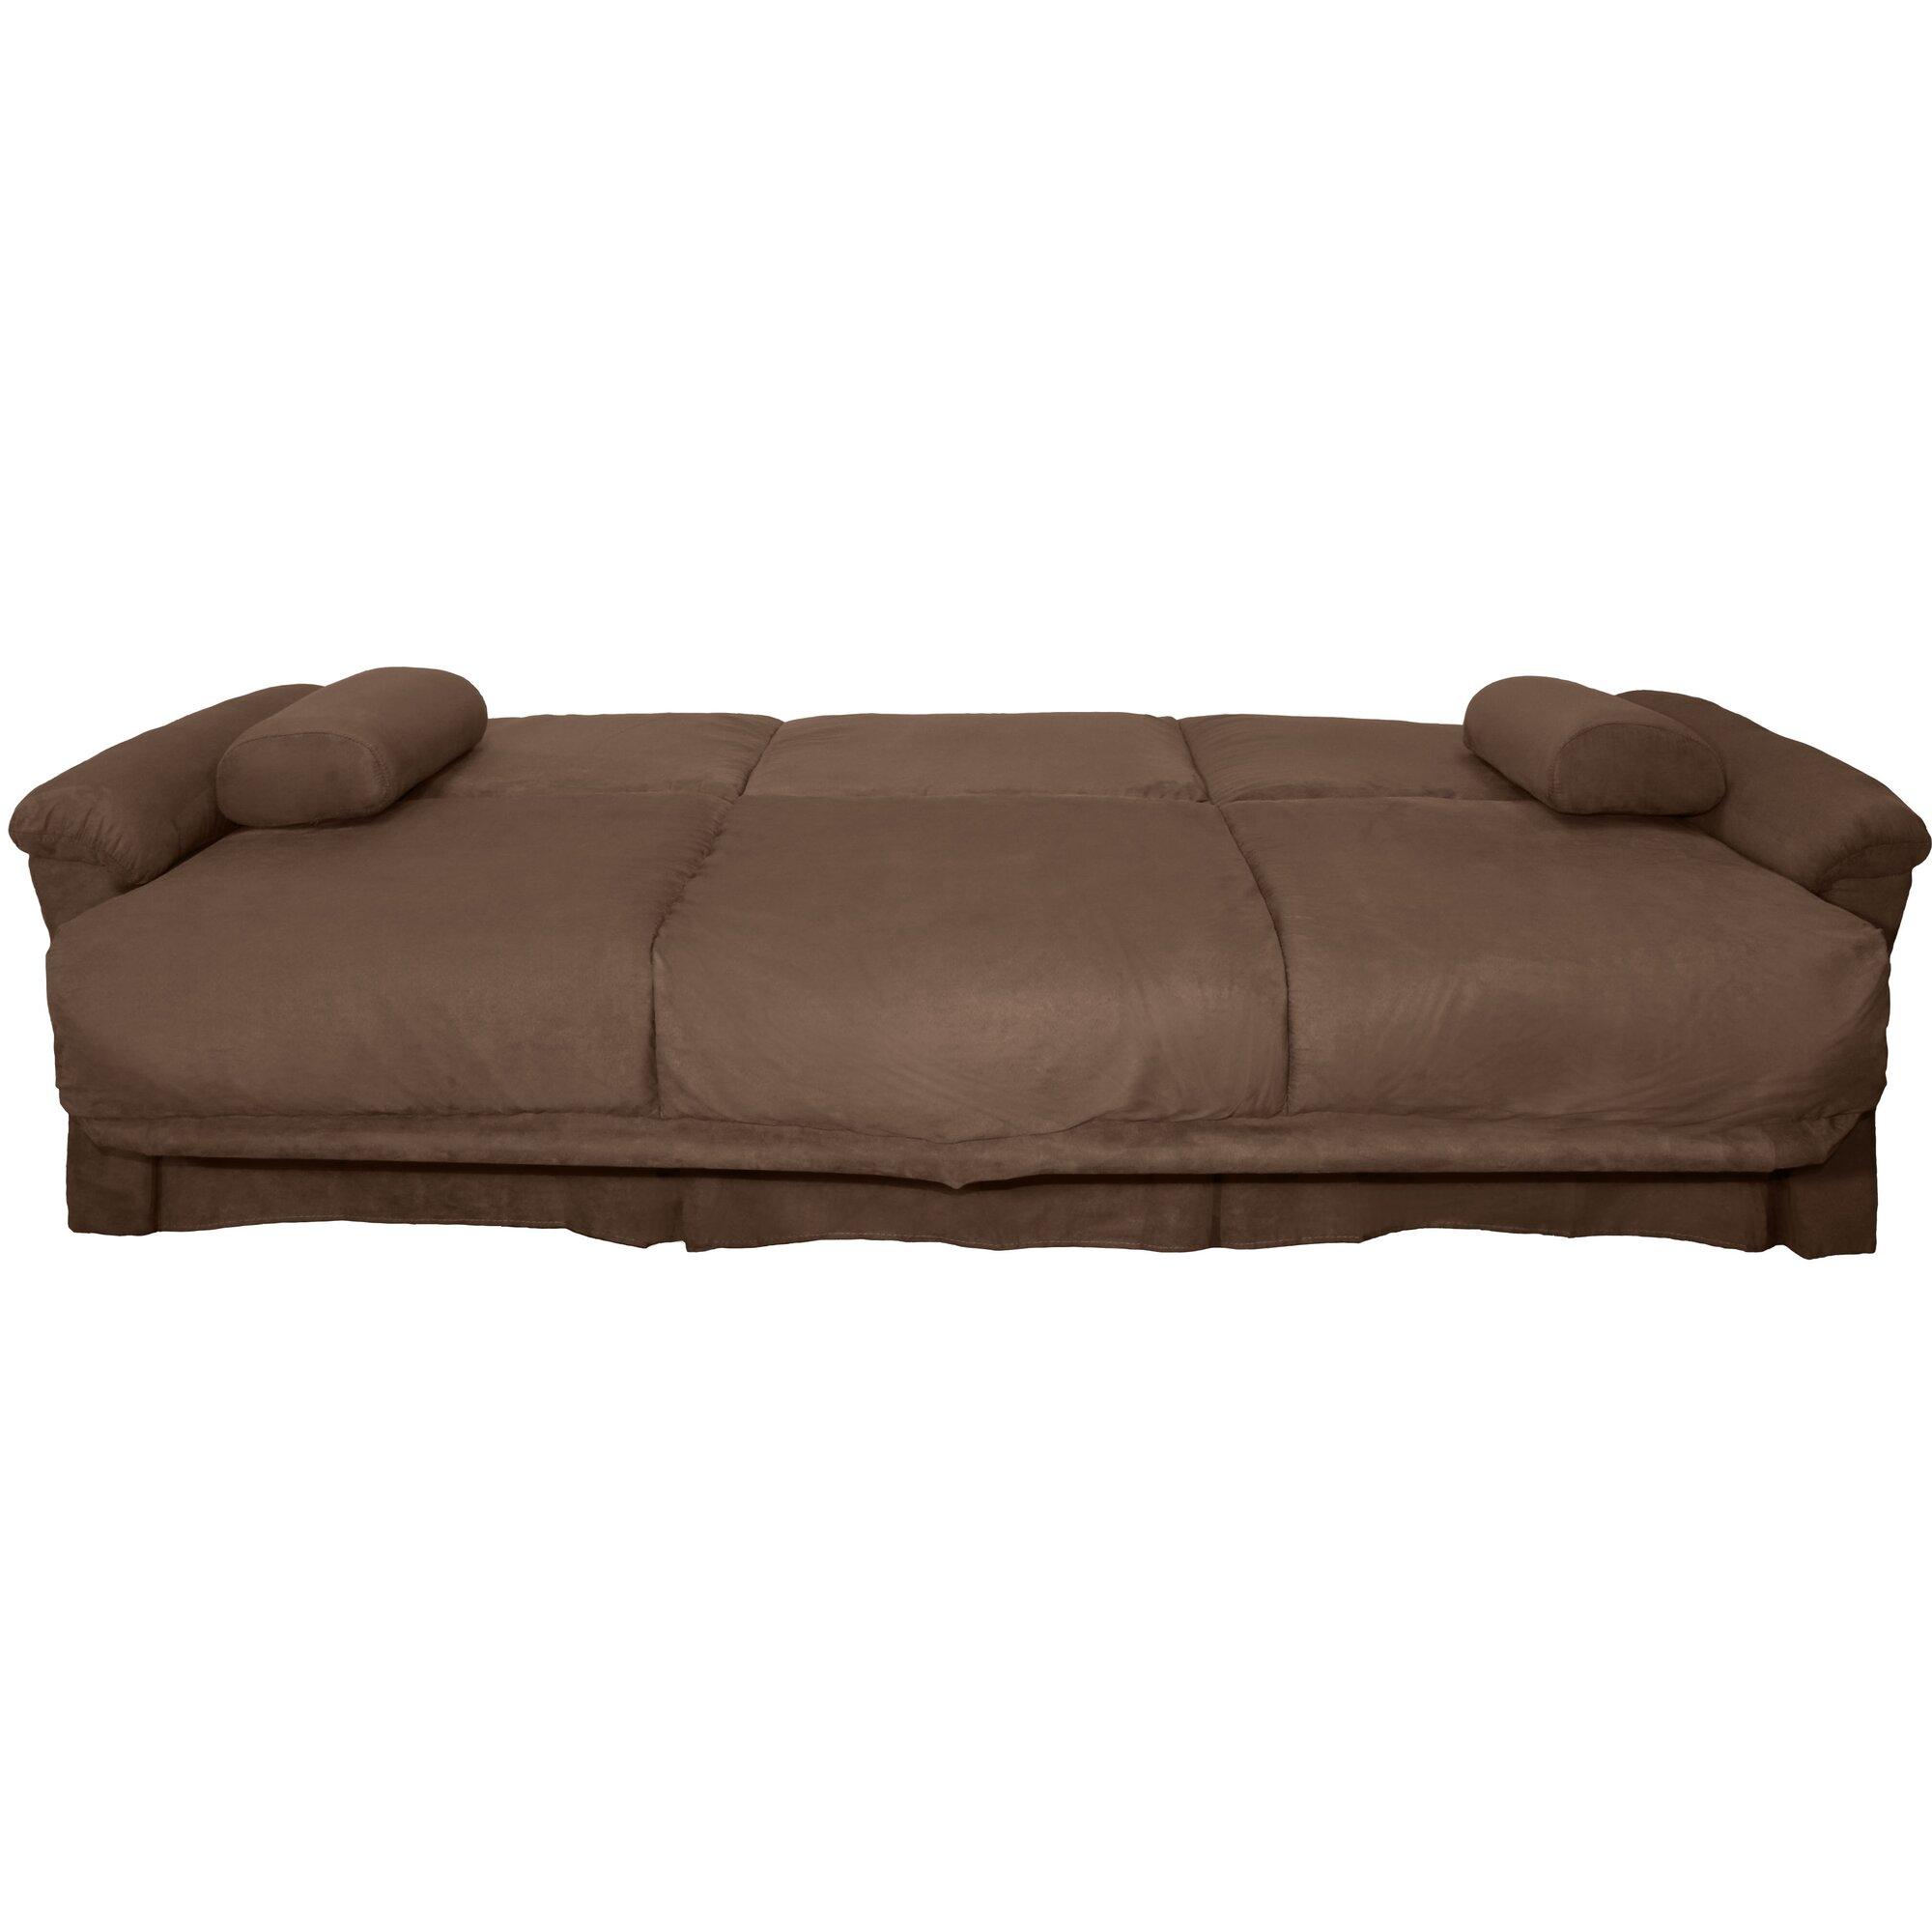 The Perfect Sleep Chair Instachair